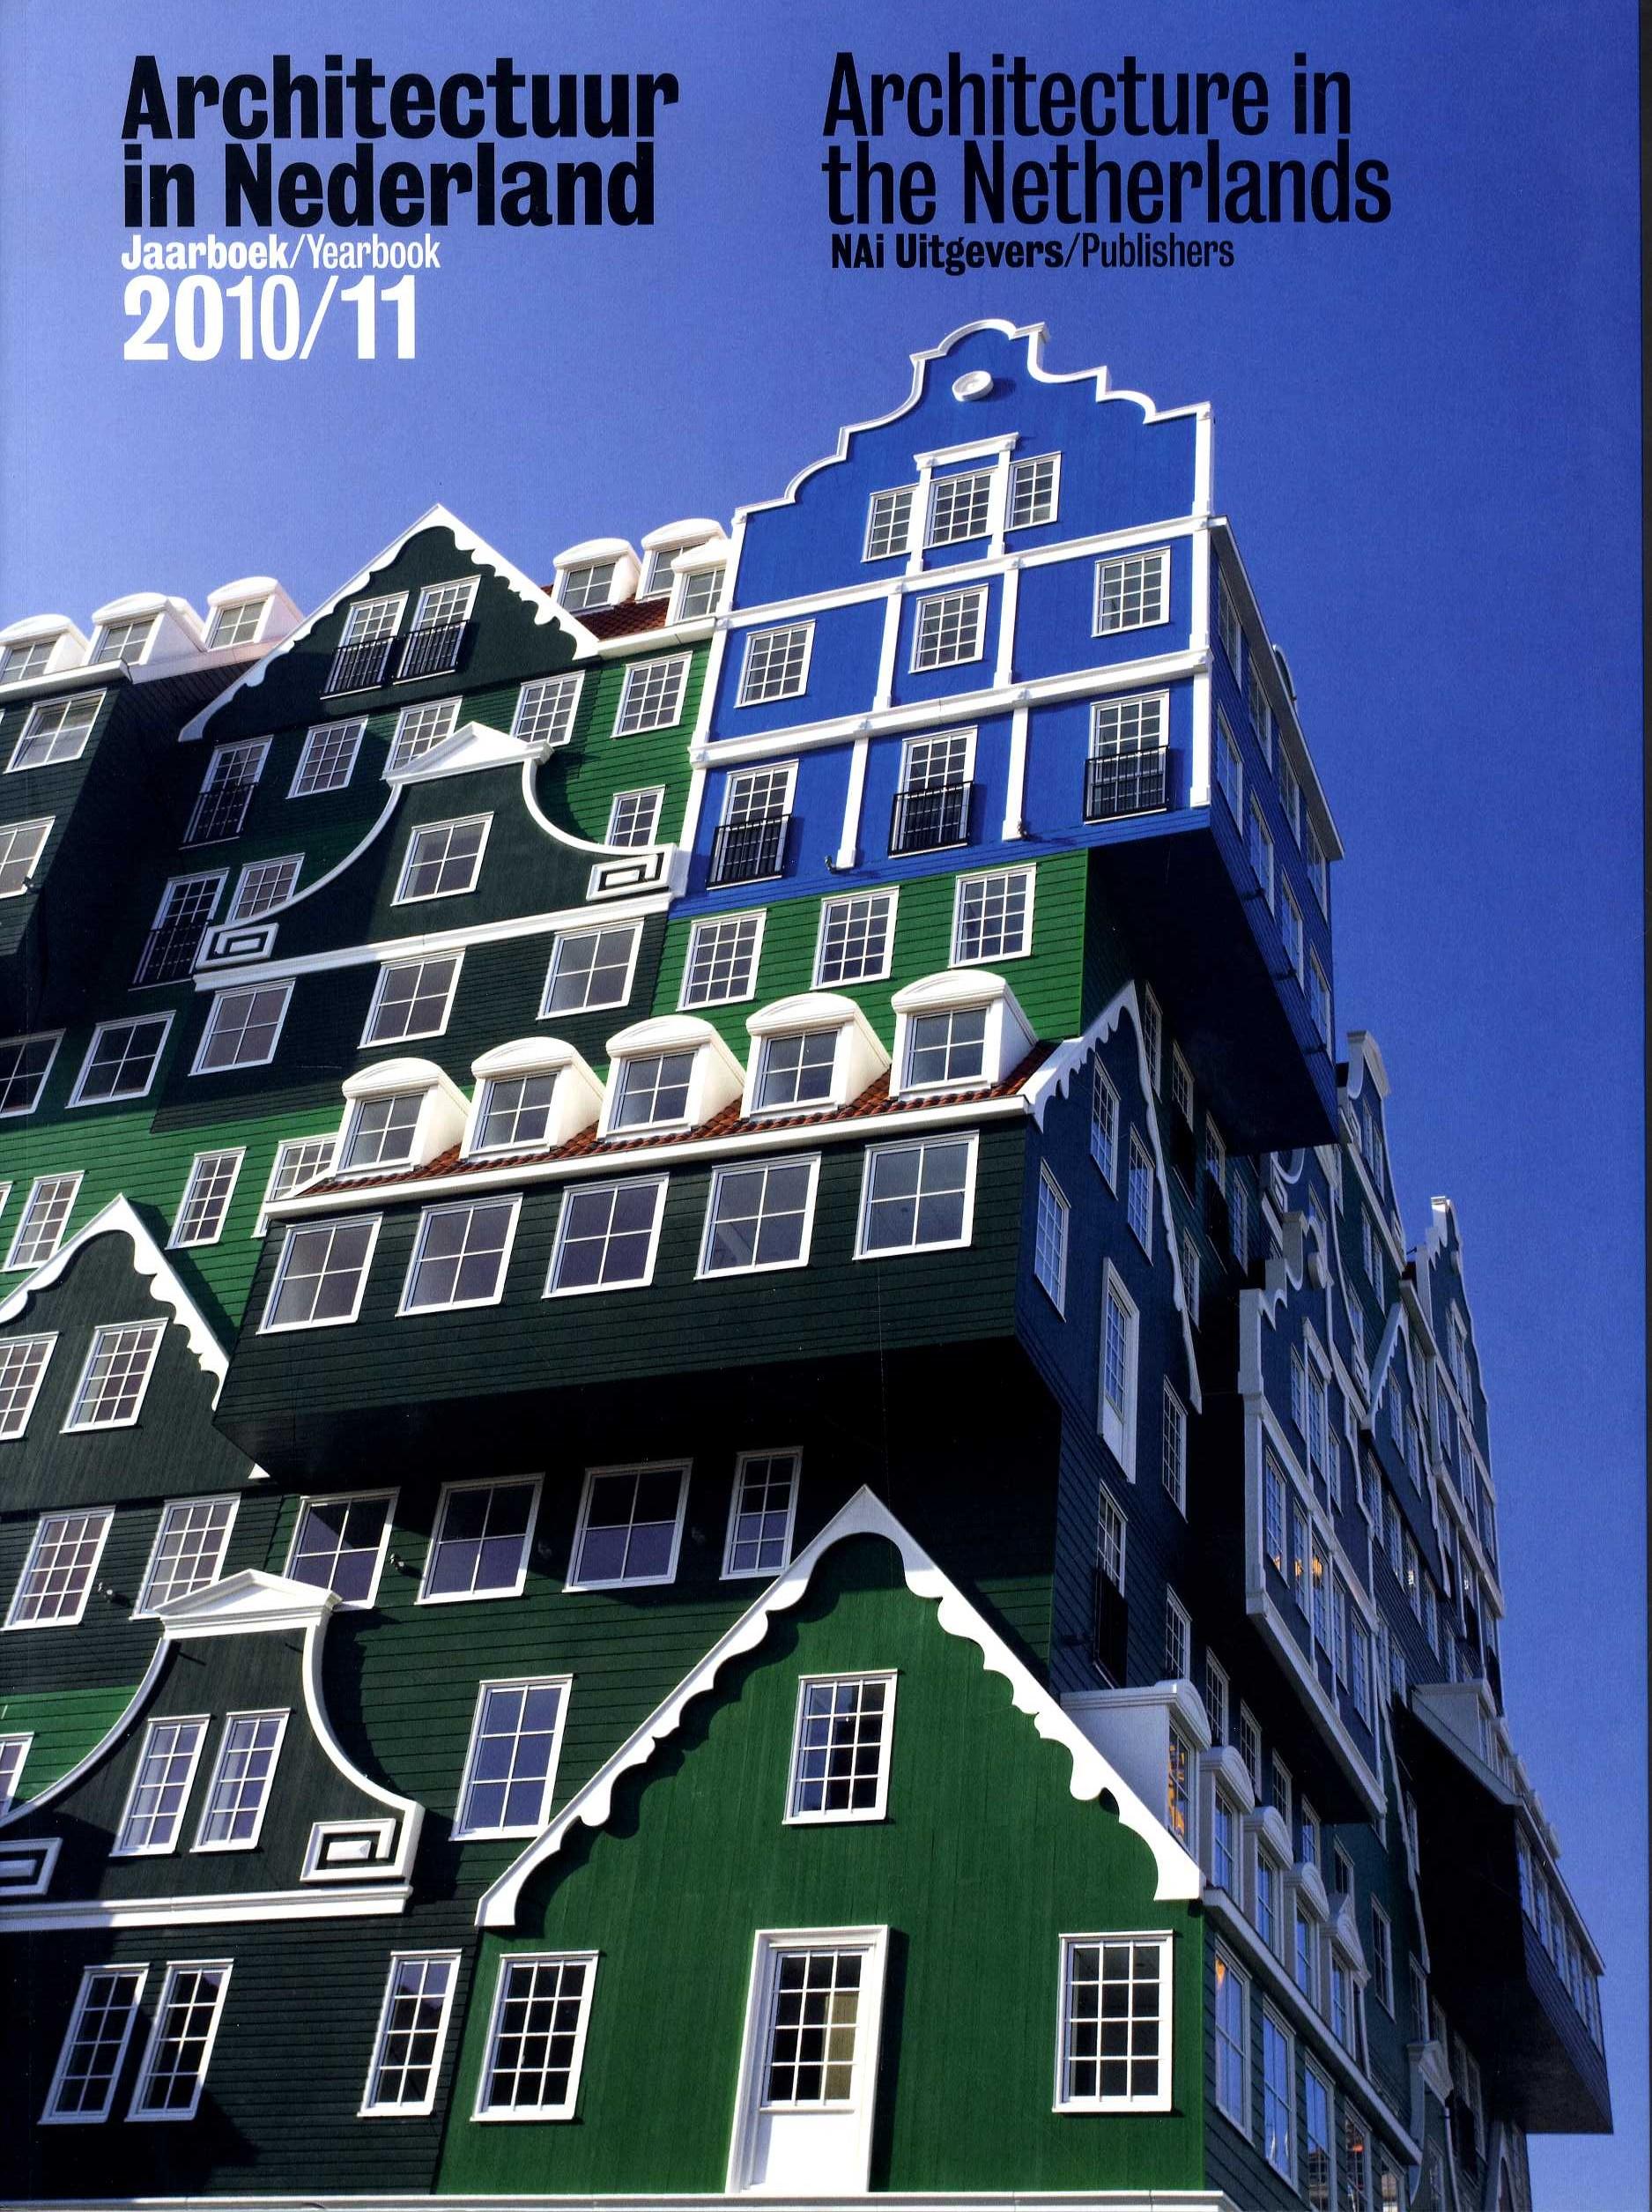 Nederland Jaarboek In-nederland-jaarboek-2010